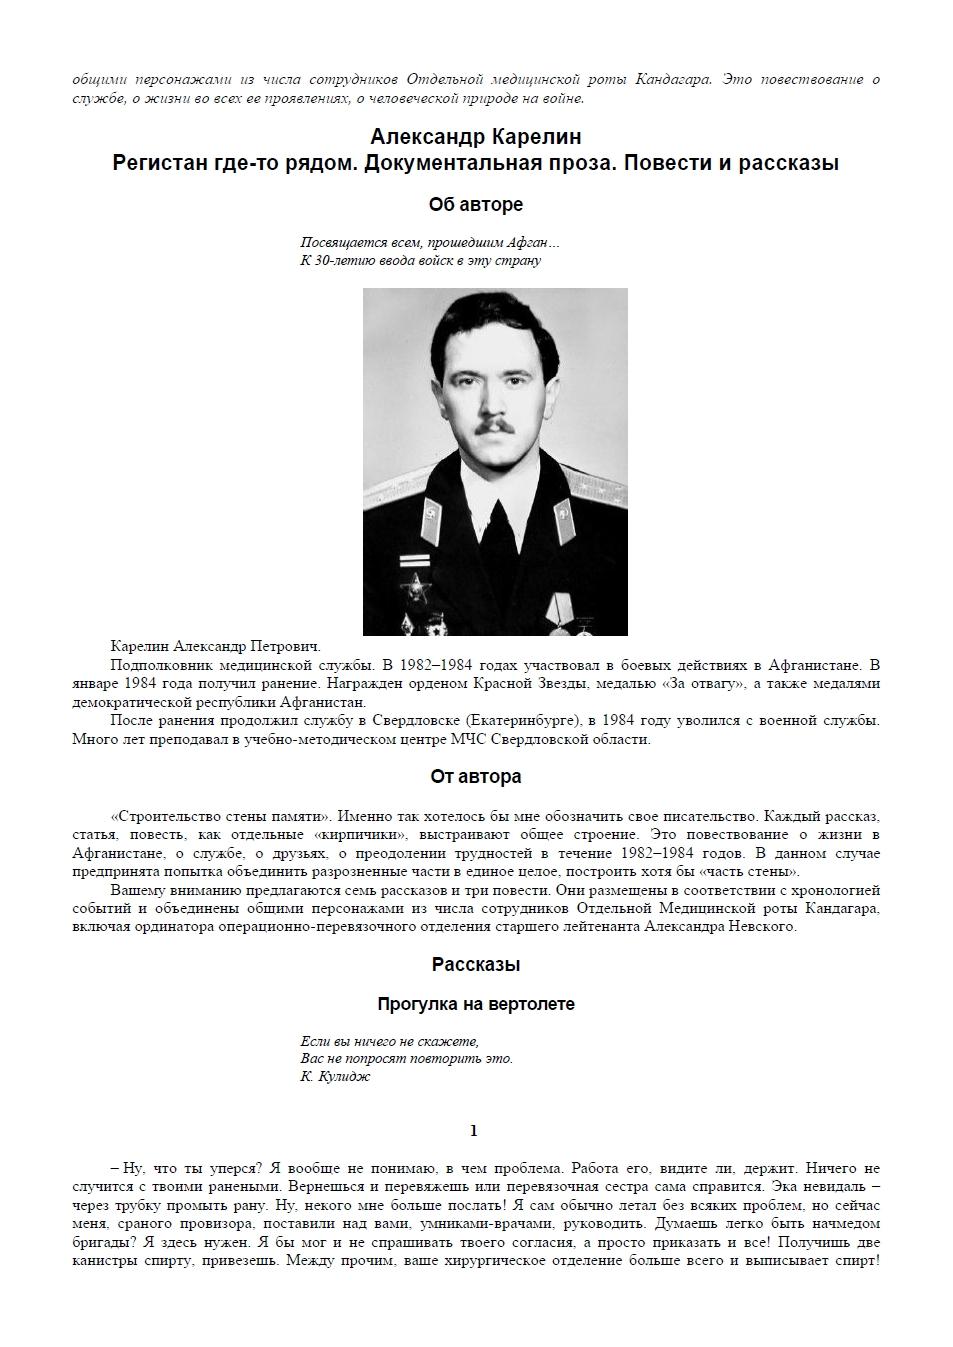 http://images.vfl.ru/ii/1405951489/f63a9ca8/5767179.jpg